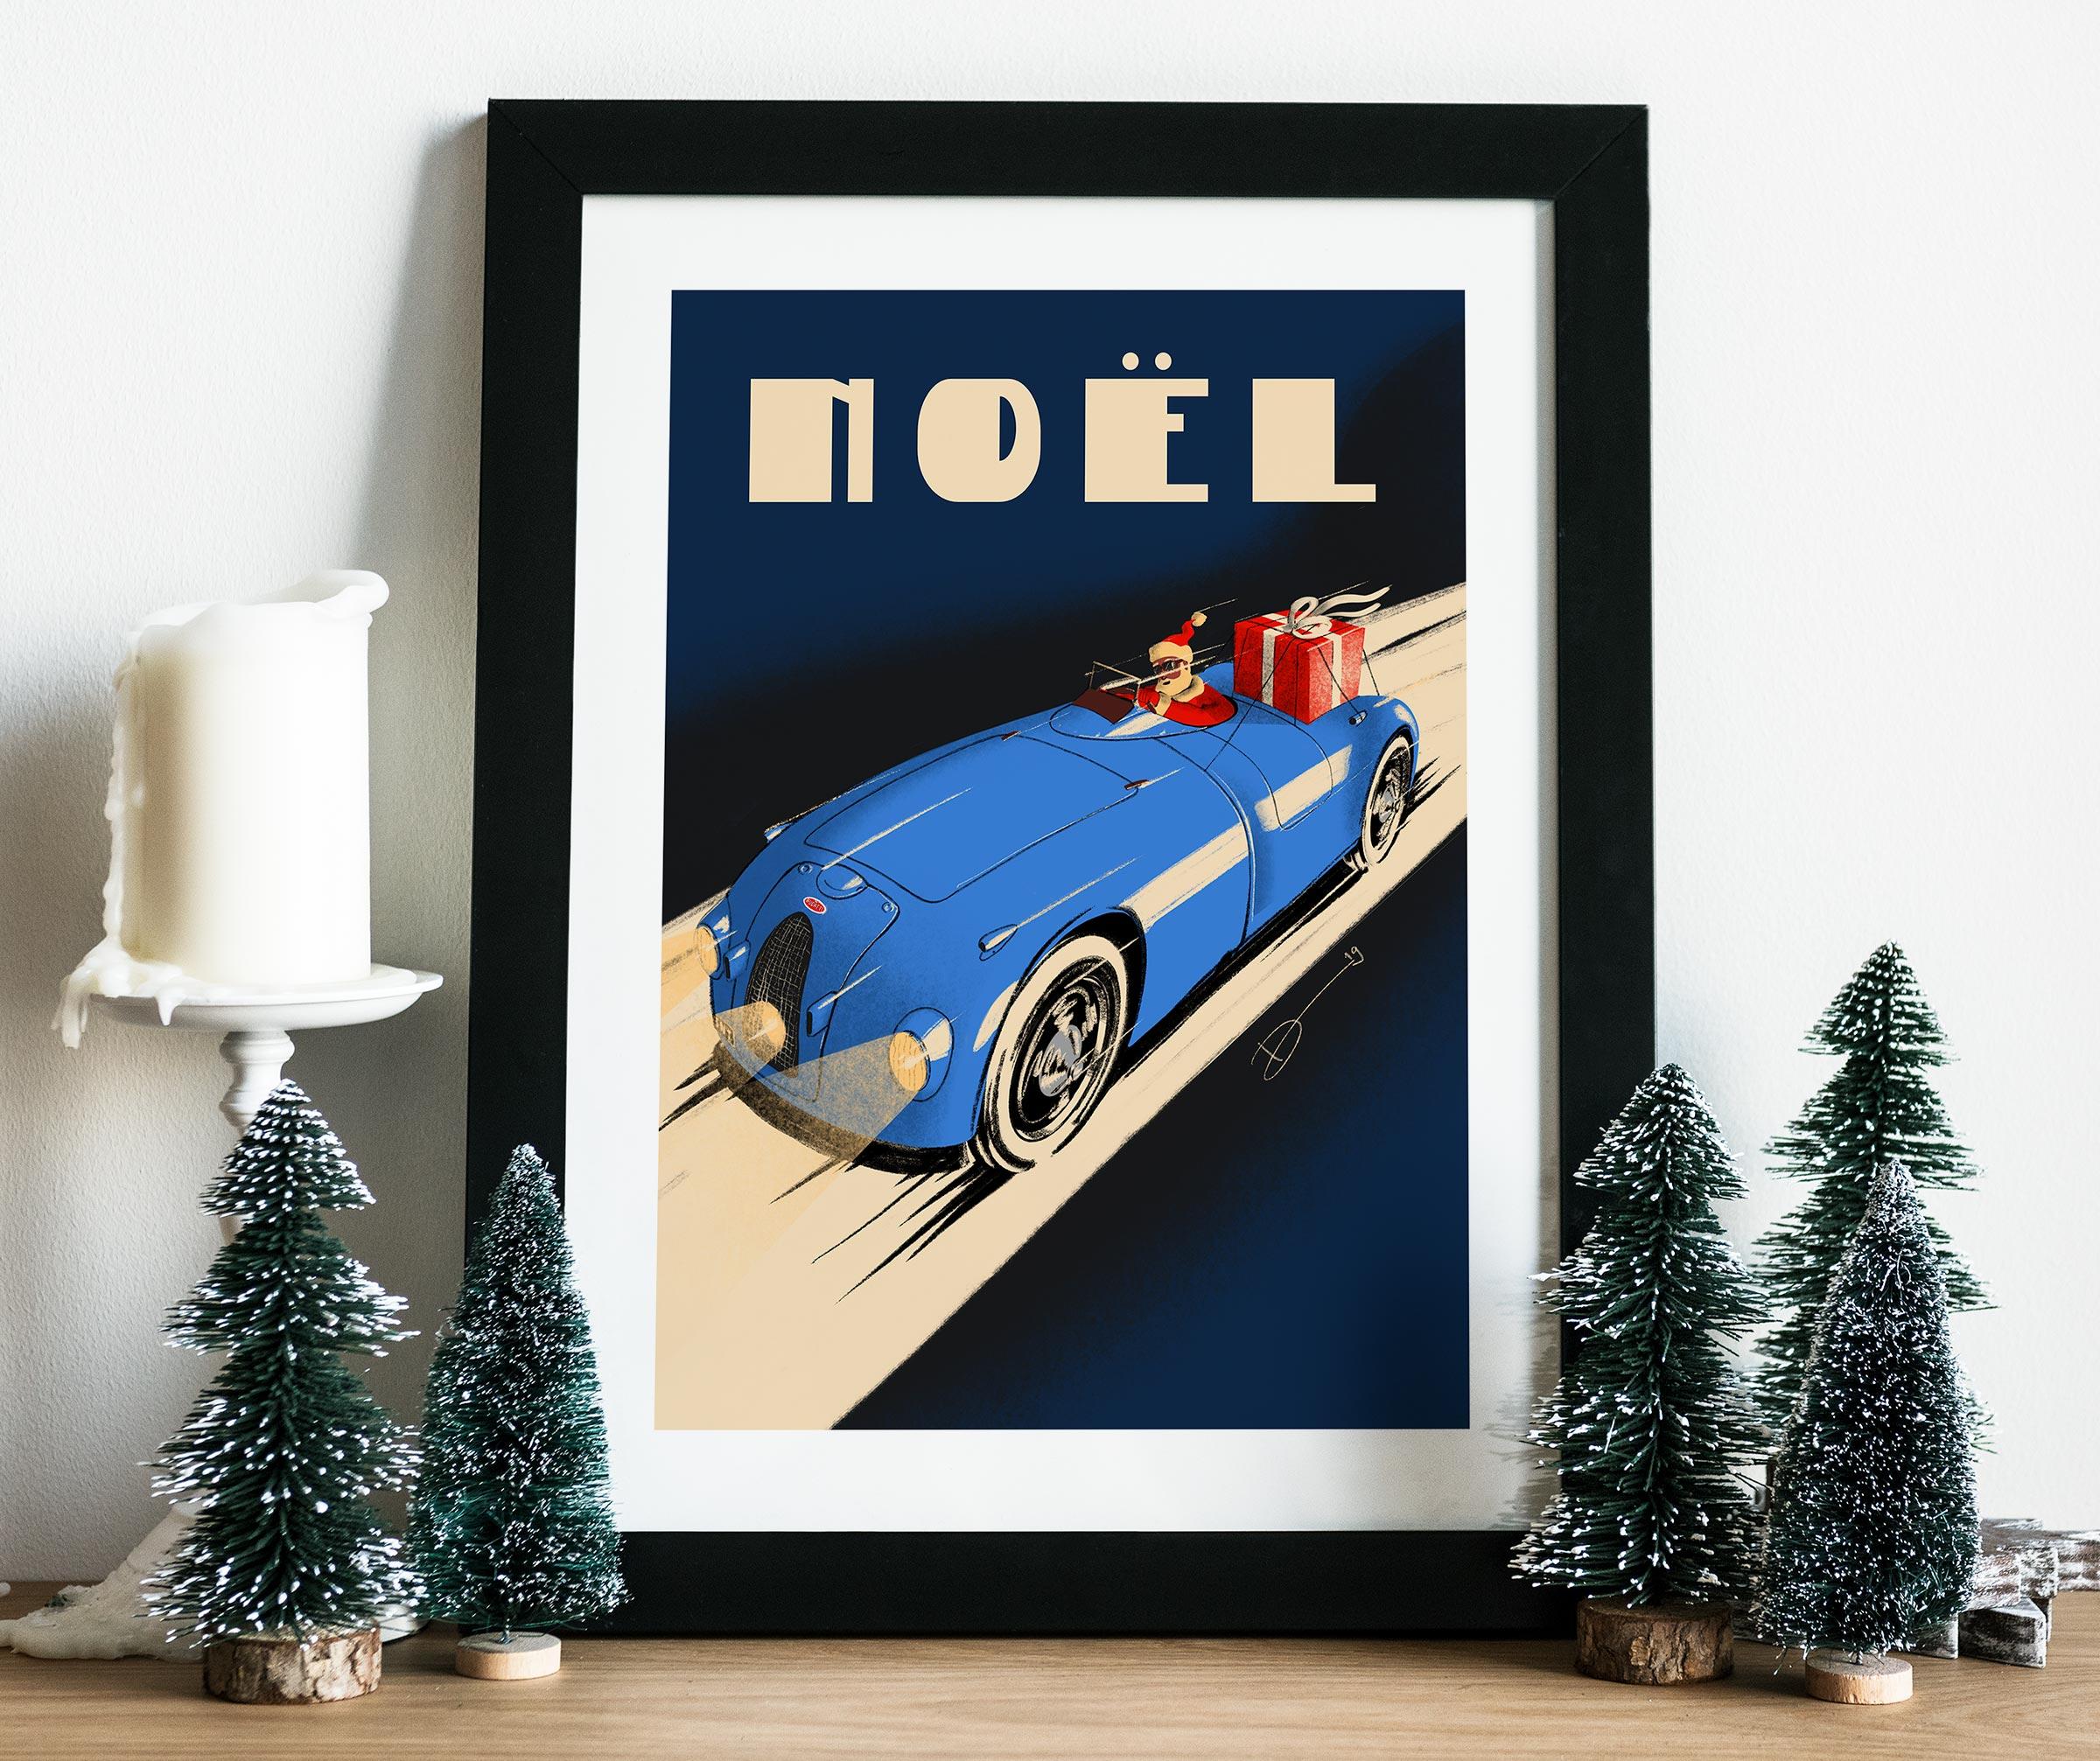 2019 Christmas Poster mockup-Bugatti Noel